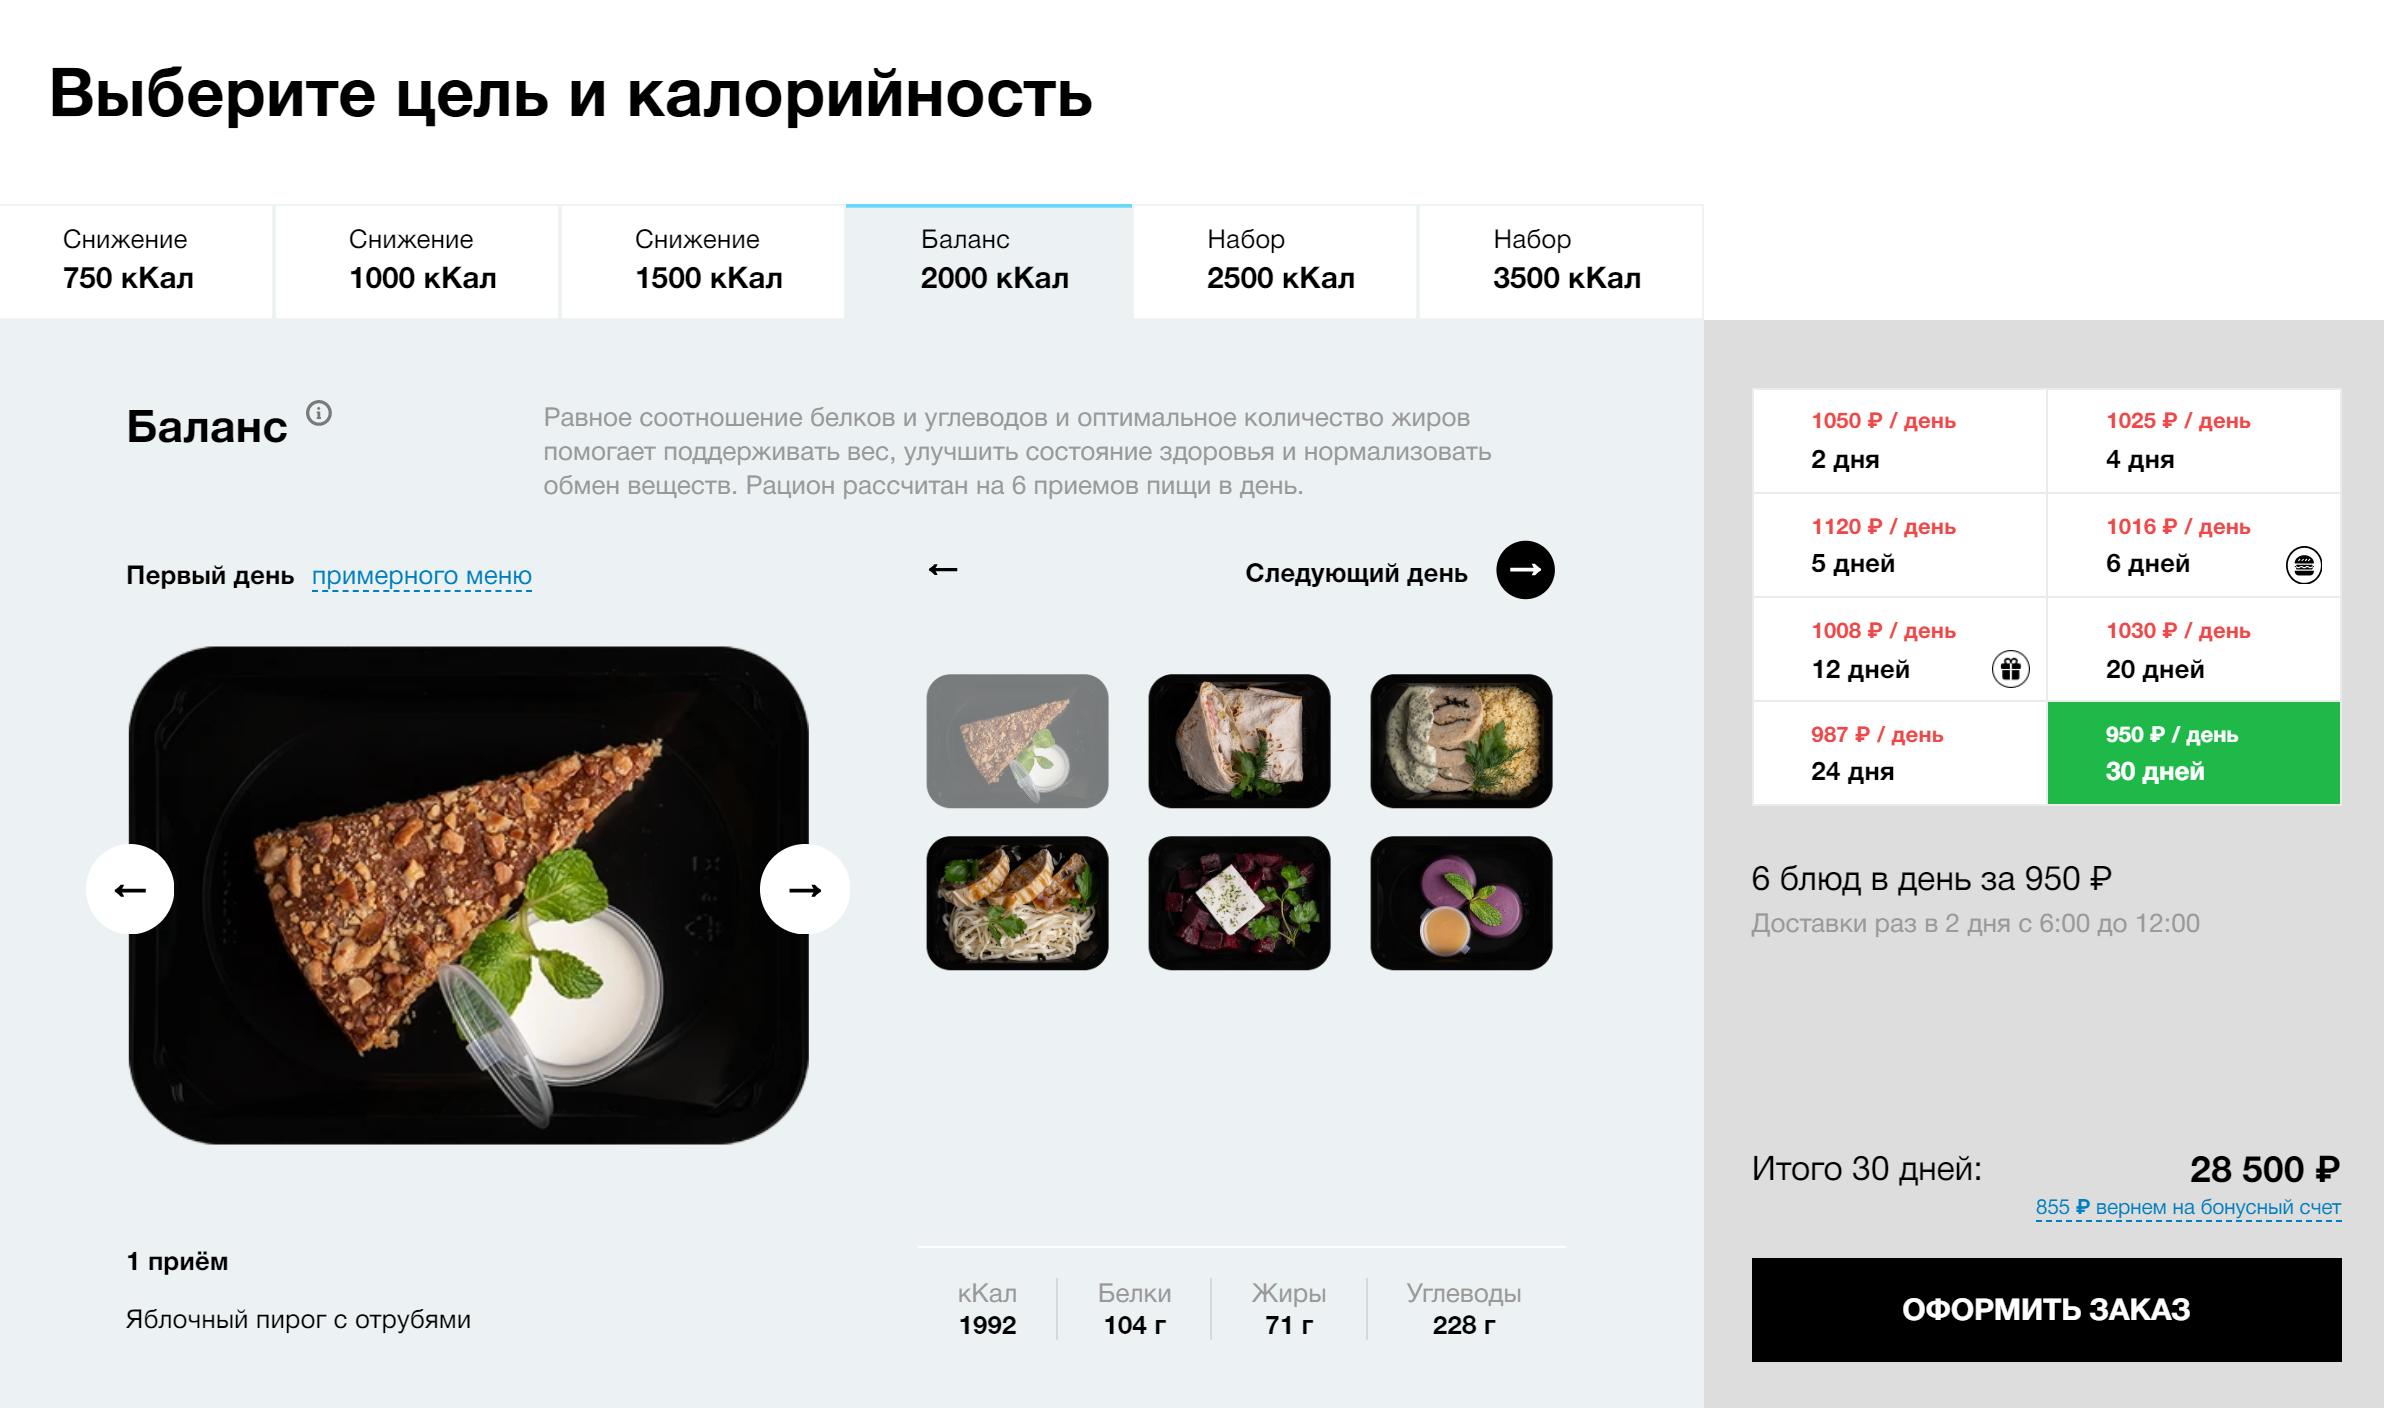 Вариант сбалансированного рациона от сервиса Level Kitchen стоит 28 500<span class=ruble>Р</span> в месяц на одного человека